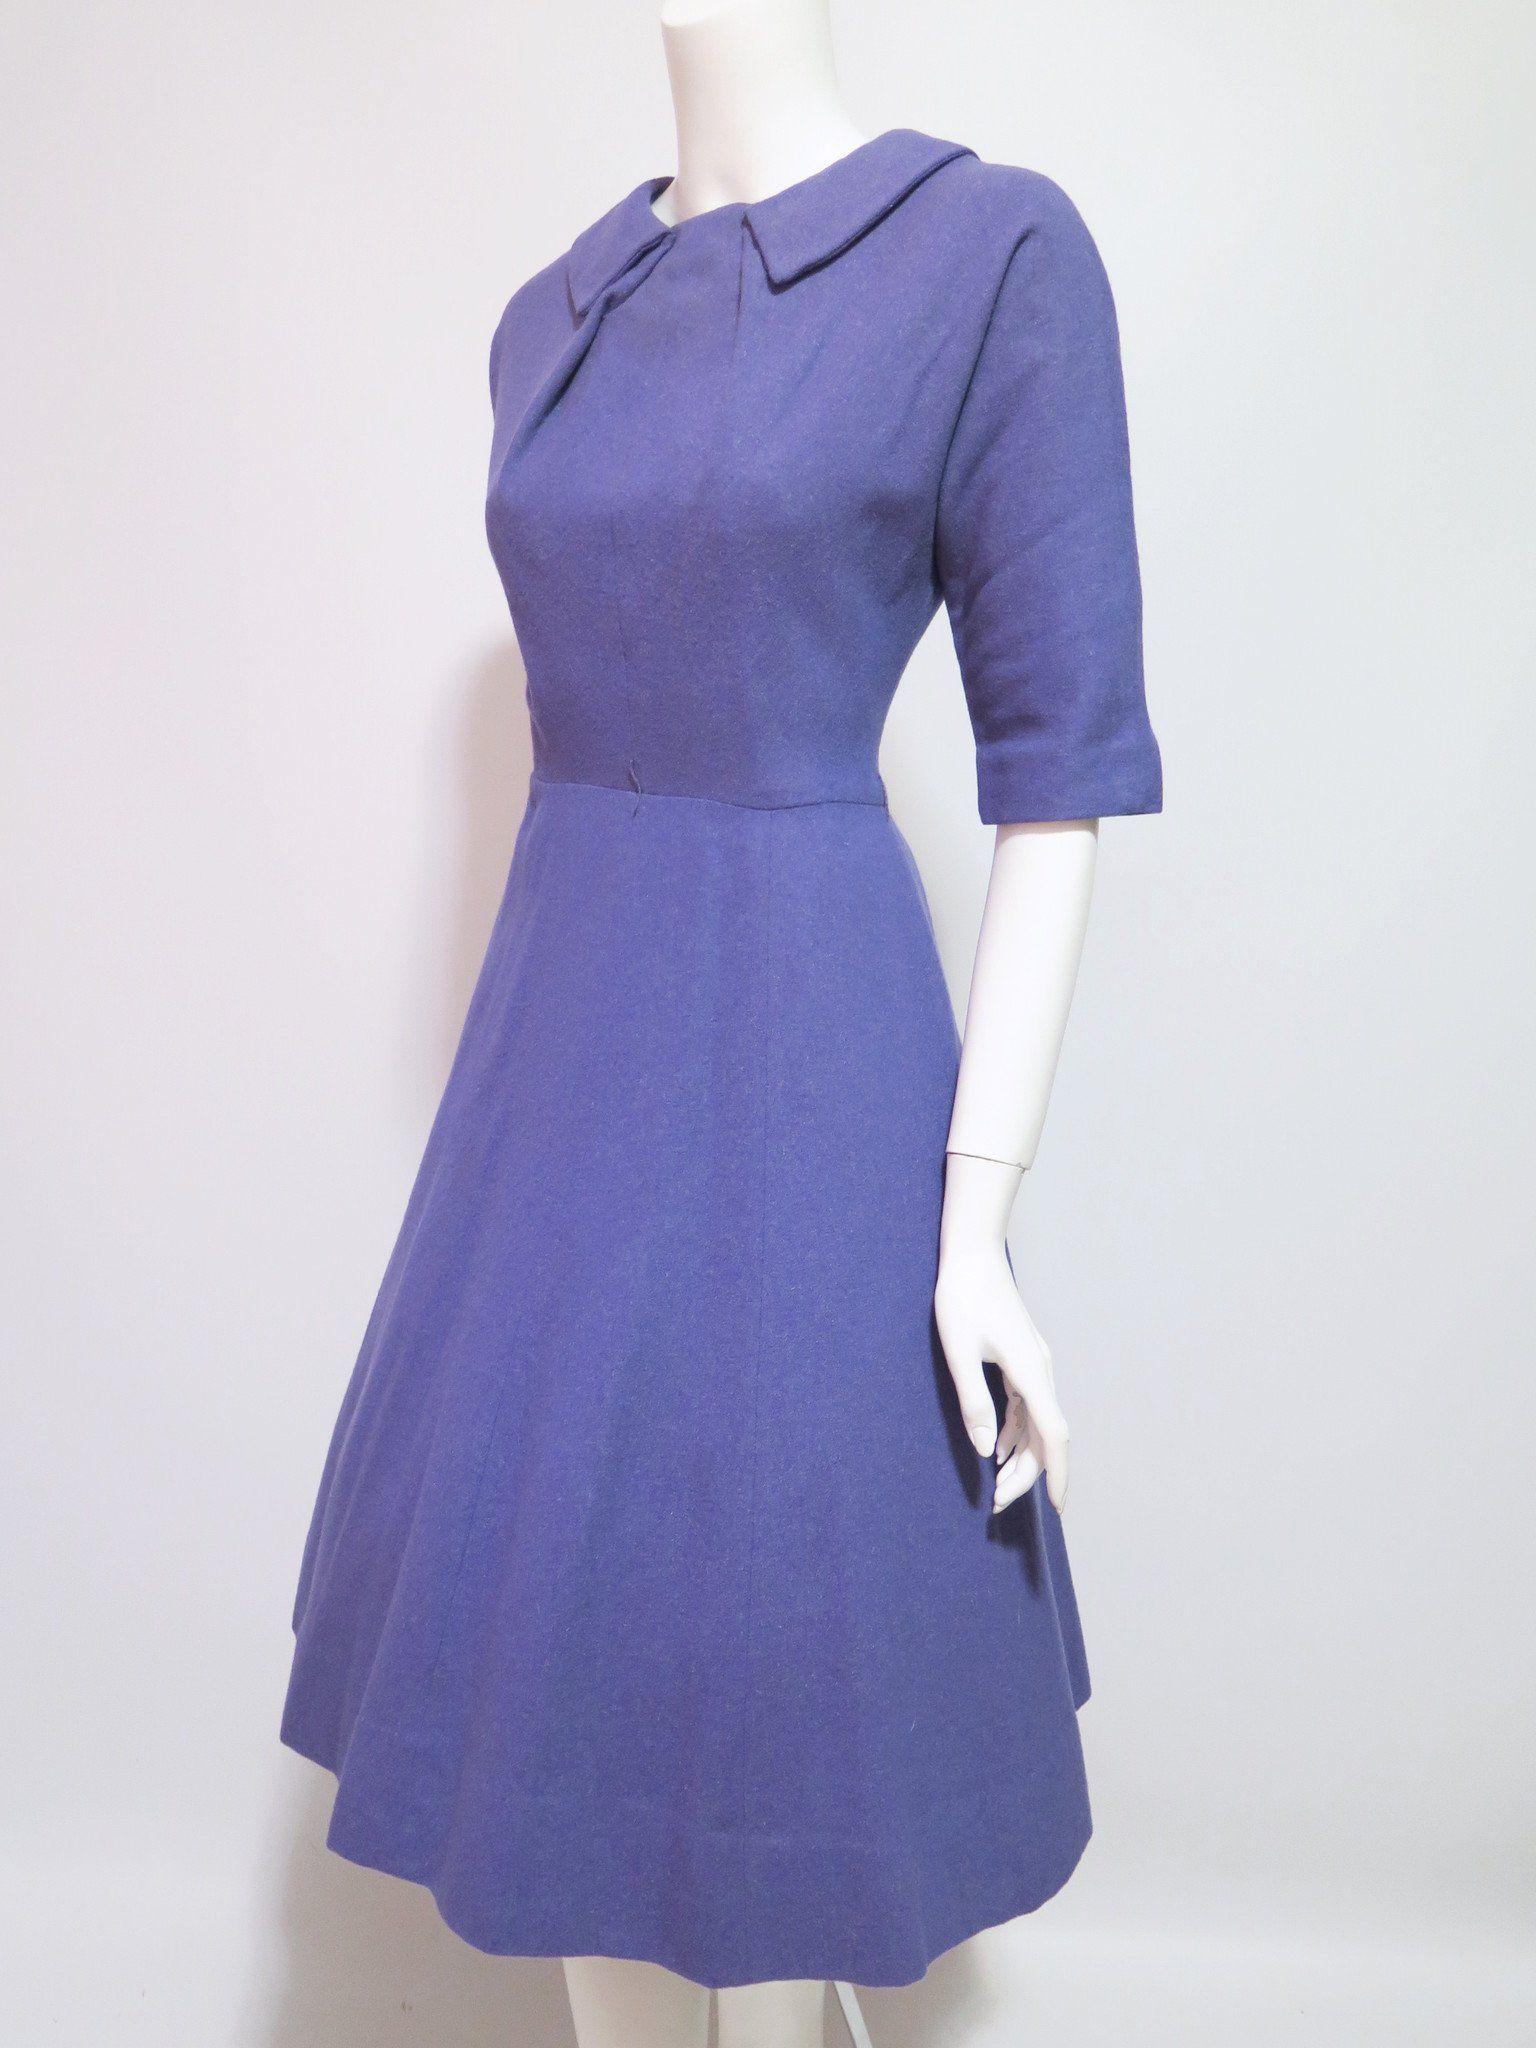 Único Vestidos De Novia De La Década De 1950 Ideas Ornamento ...